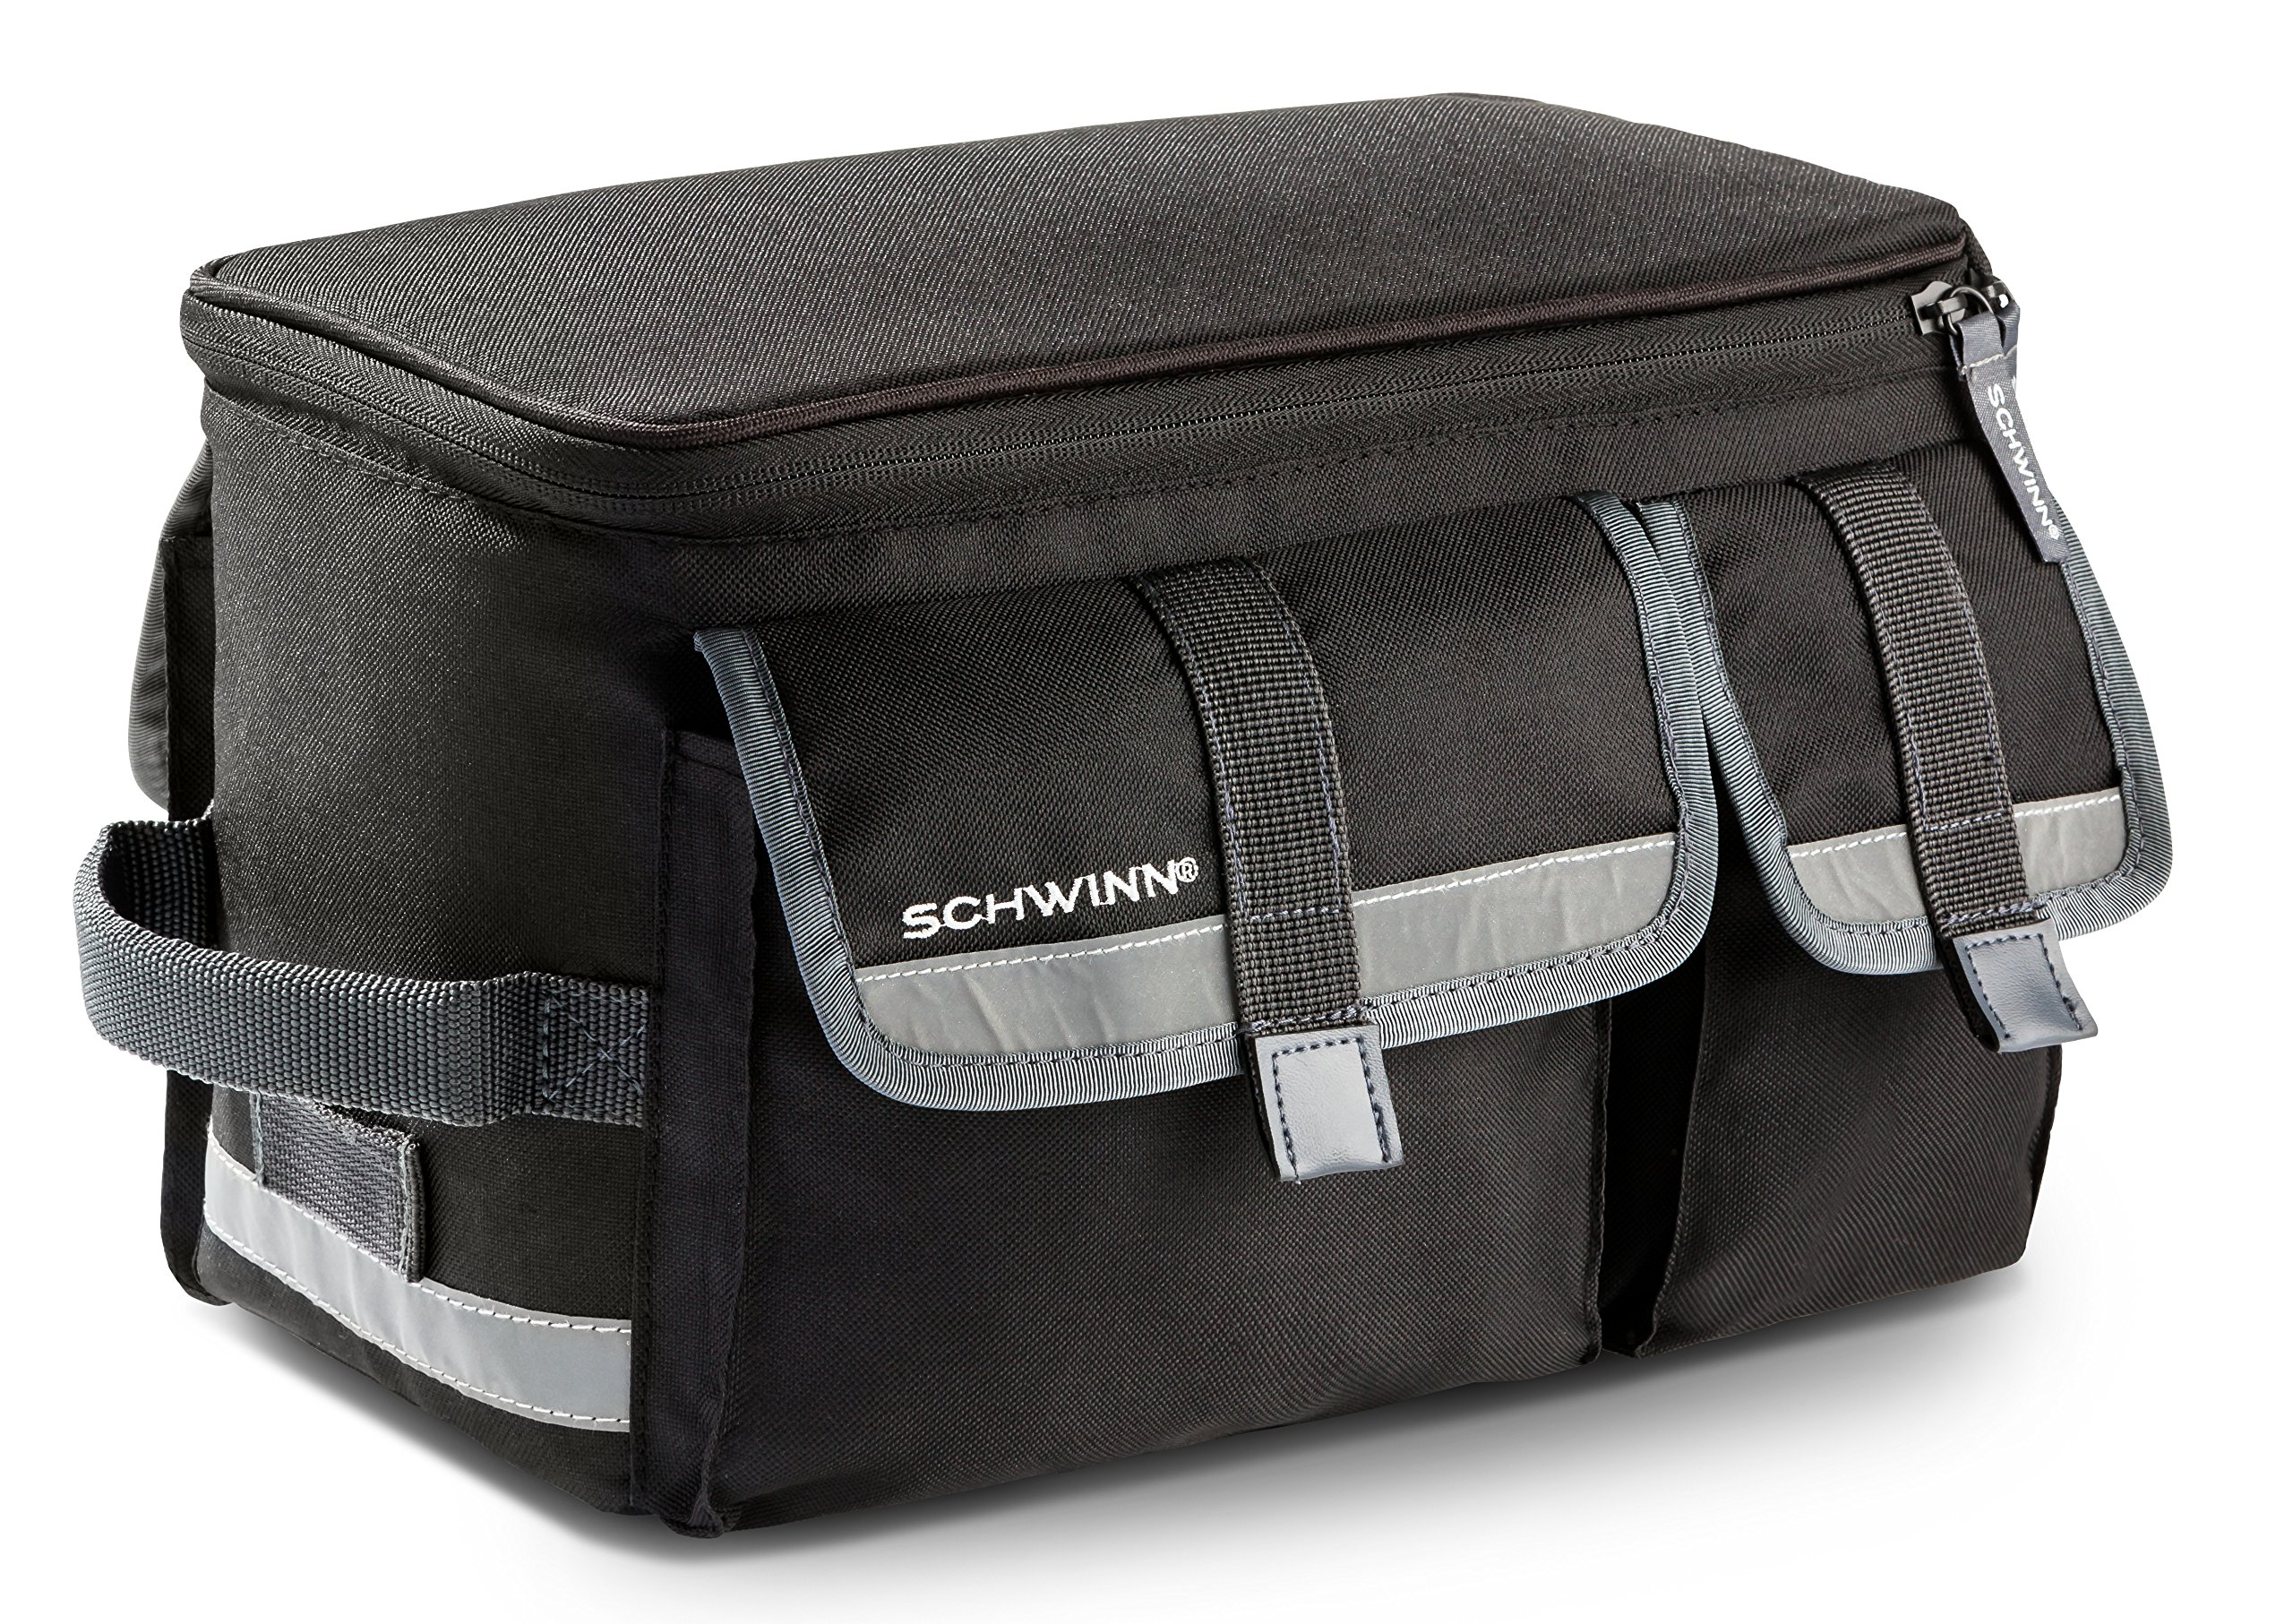 Schwinn Rack Top Bag with Reflective Strip